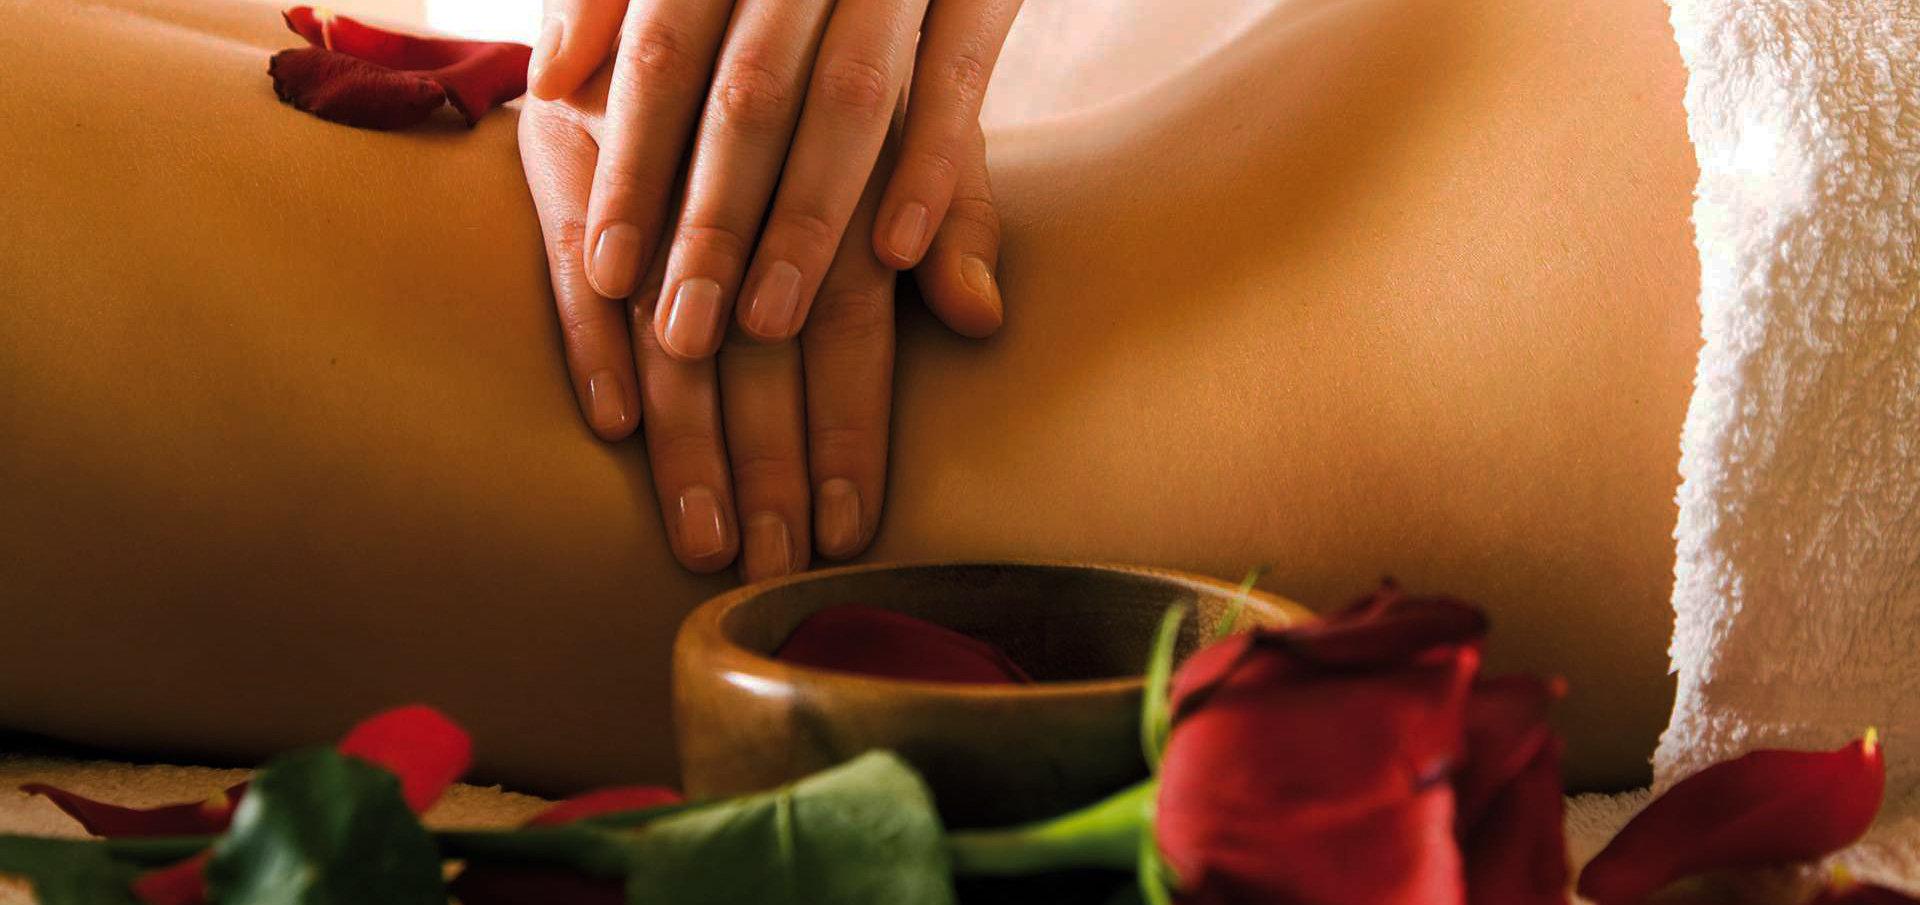 Masaje Thai con aceite aromático 1 hr